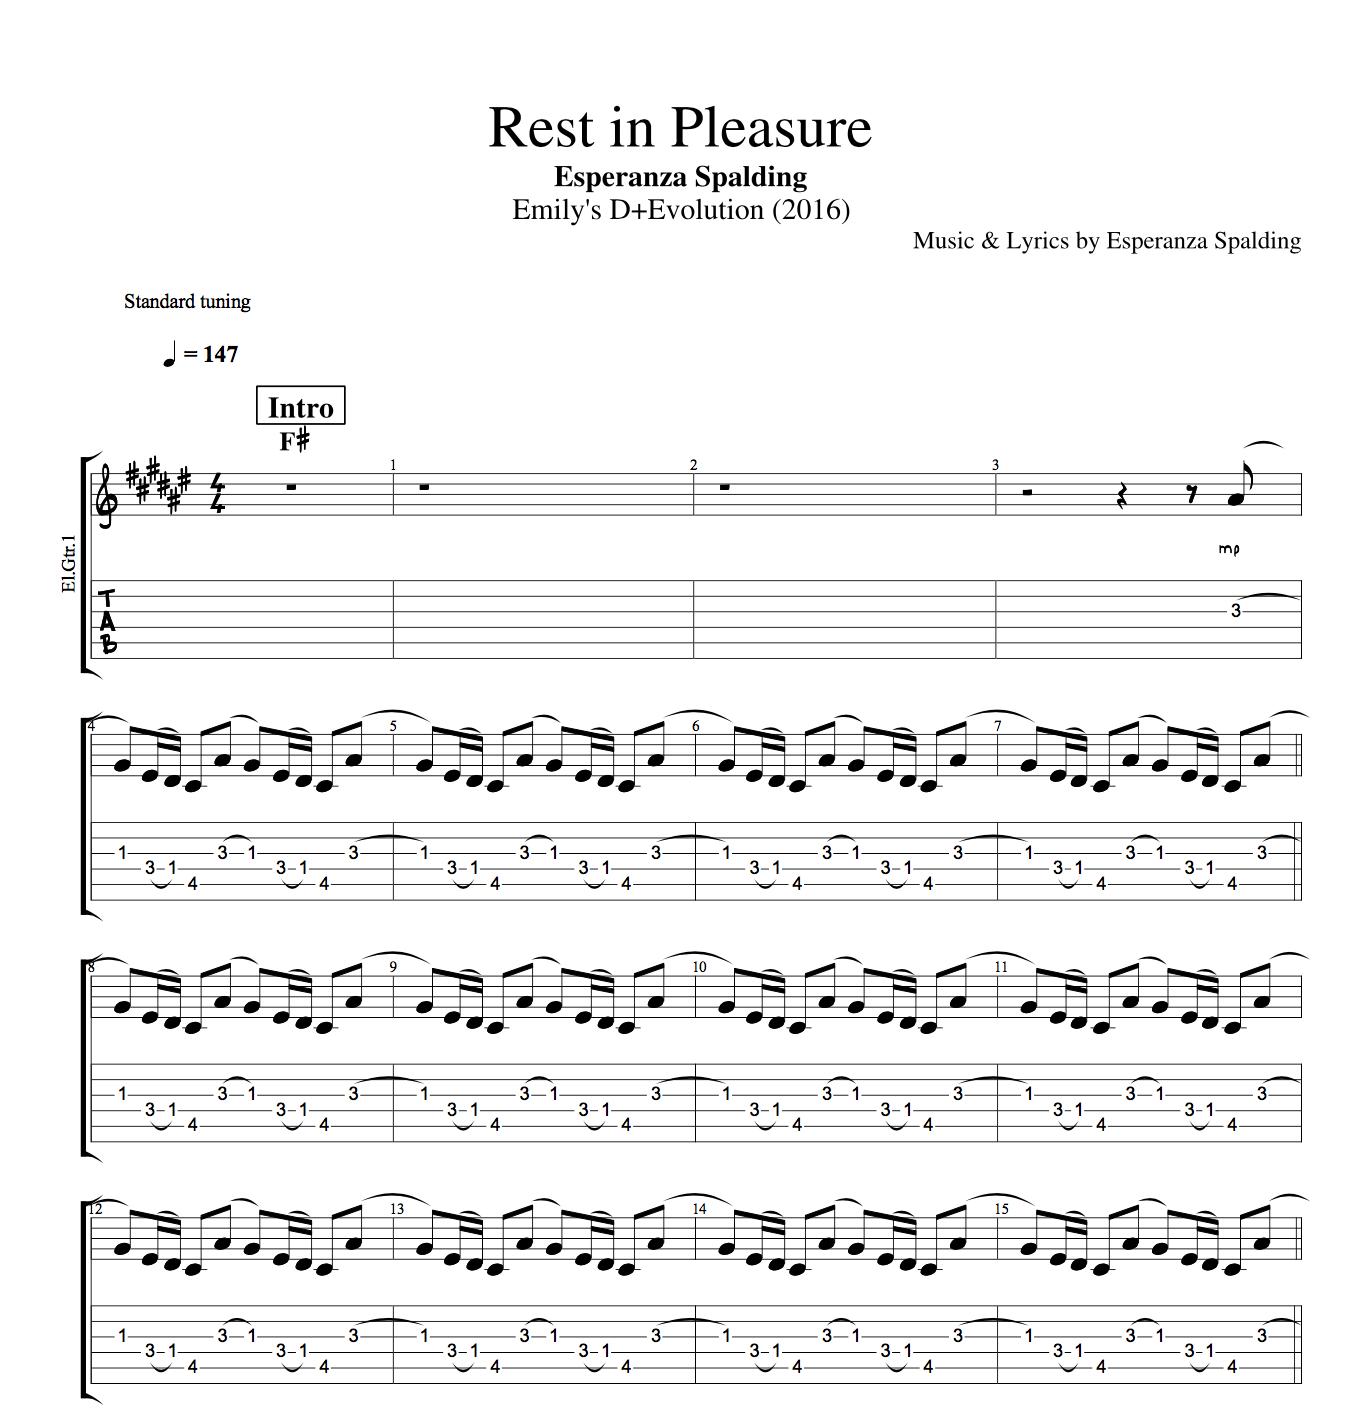 Rest In Pleasure By Esperanza Spalding Guitar Bass Vocals Tabs Sheet Musicscore Chords Lyrics Play Like The Greats Com